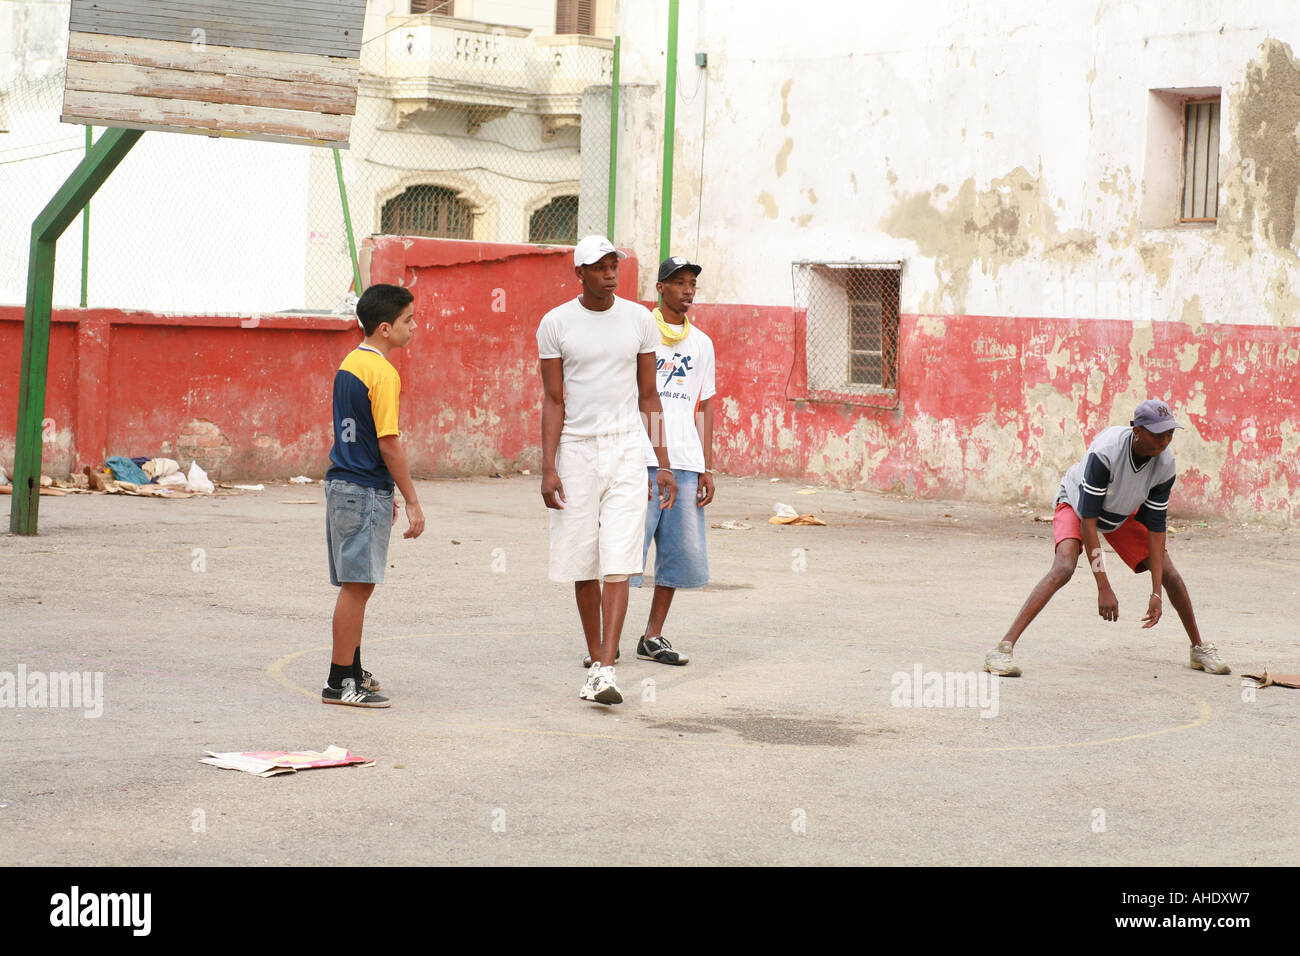 La Habana Cuba Jungs Spielen Fussball In Einem Hinterhof